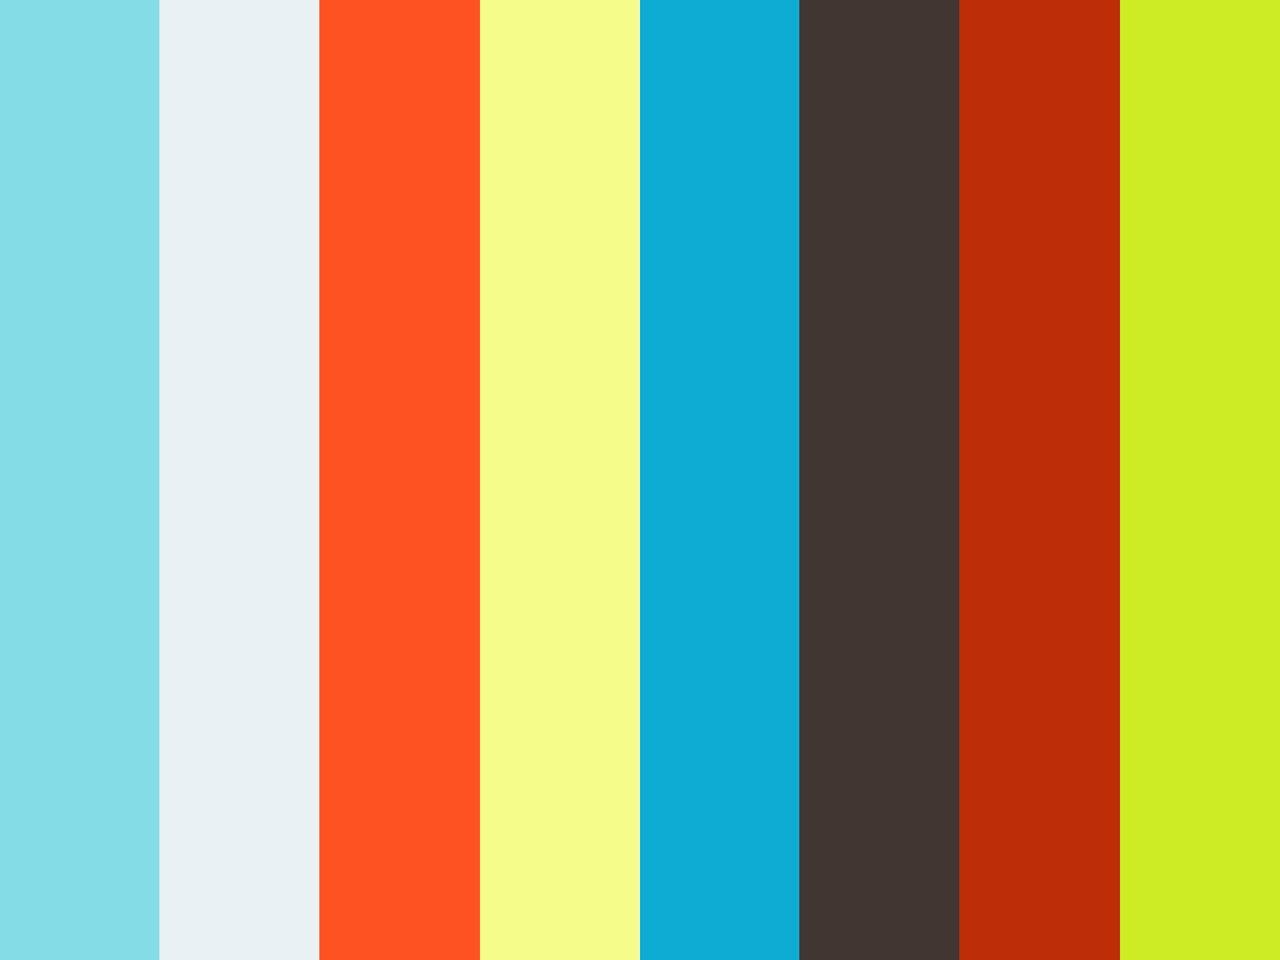 Molokai Covid19 Update - Thursday, May 14, 2020